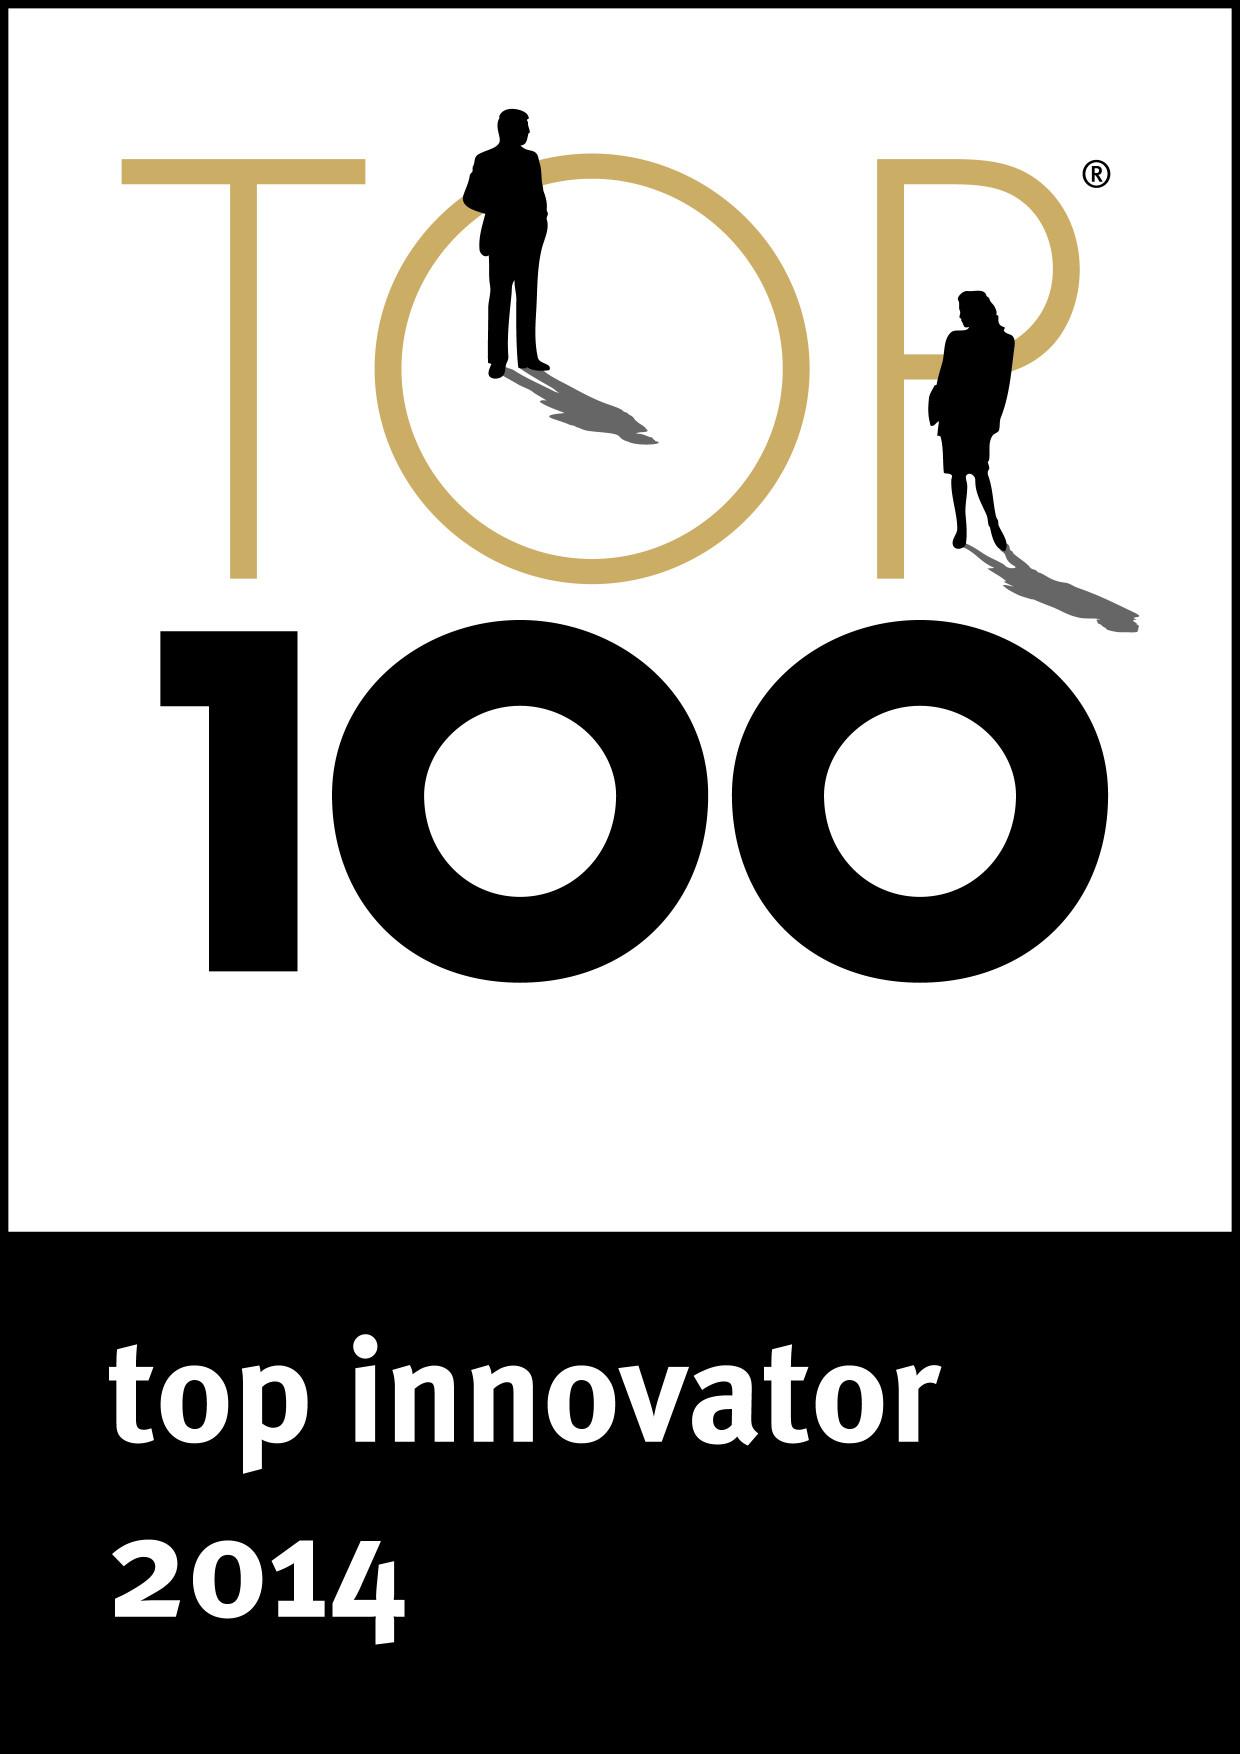 TOP Innovator 2014